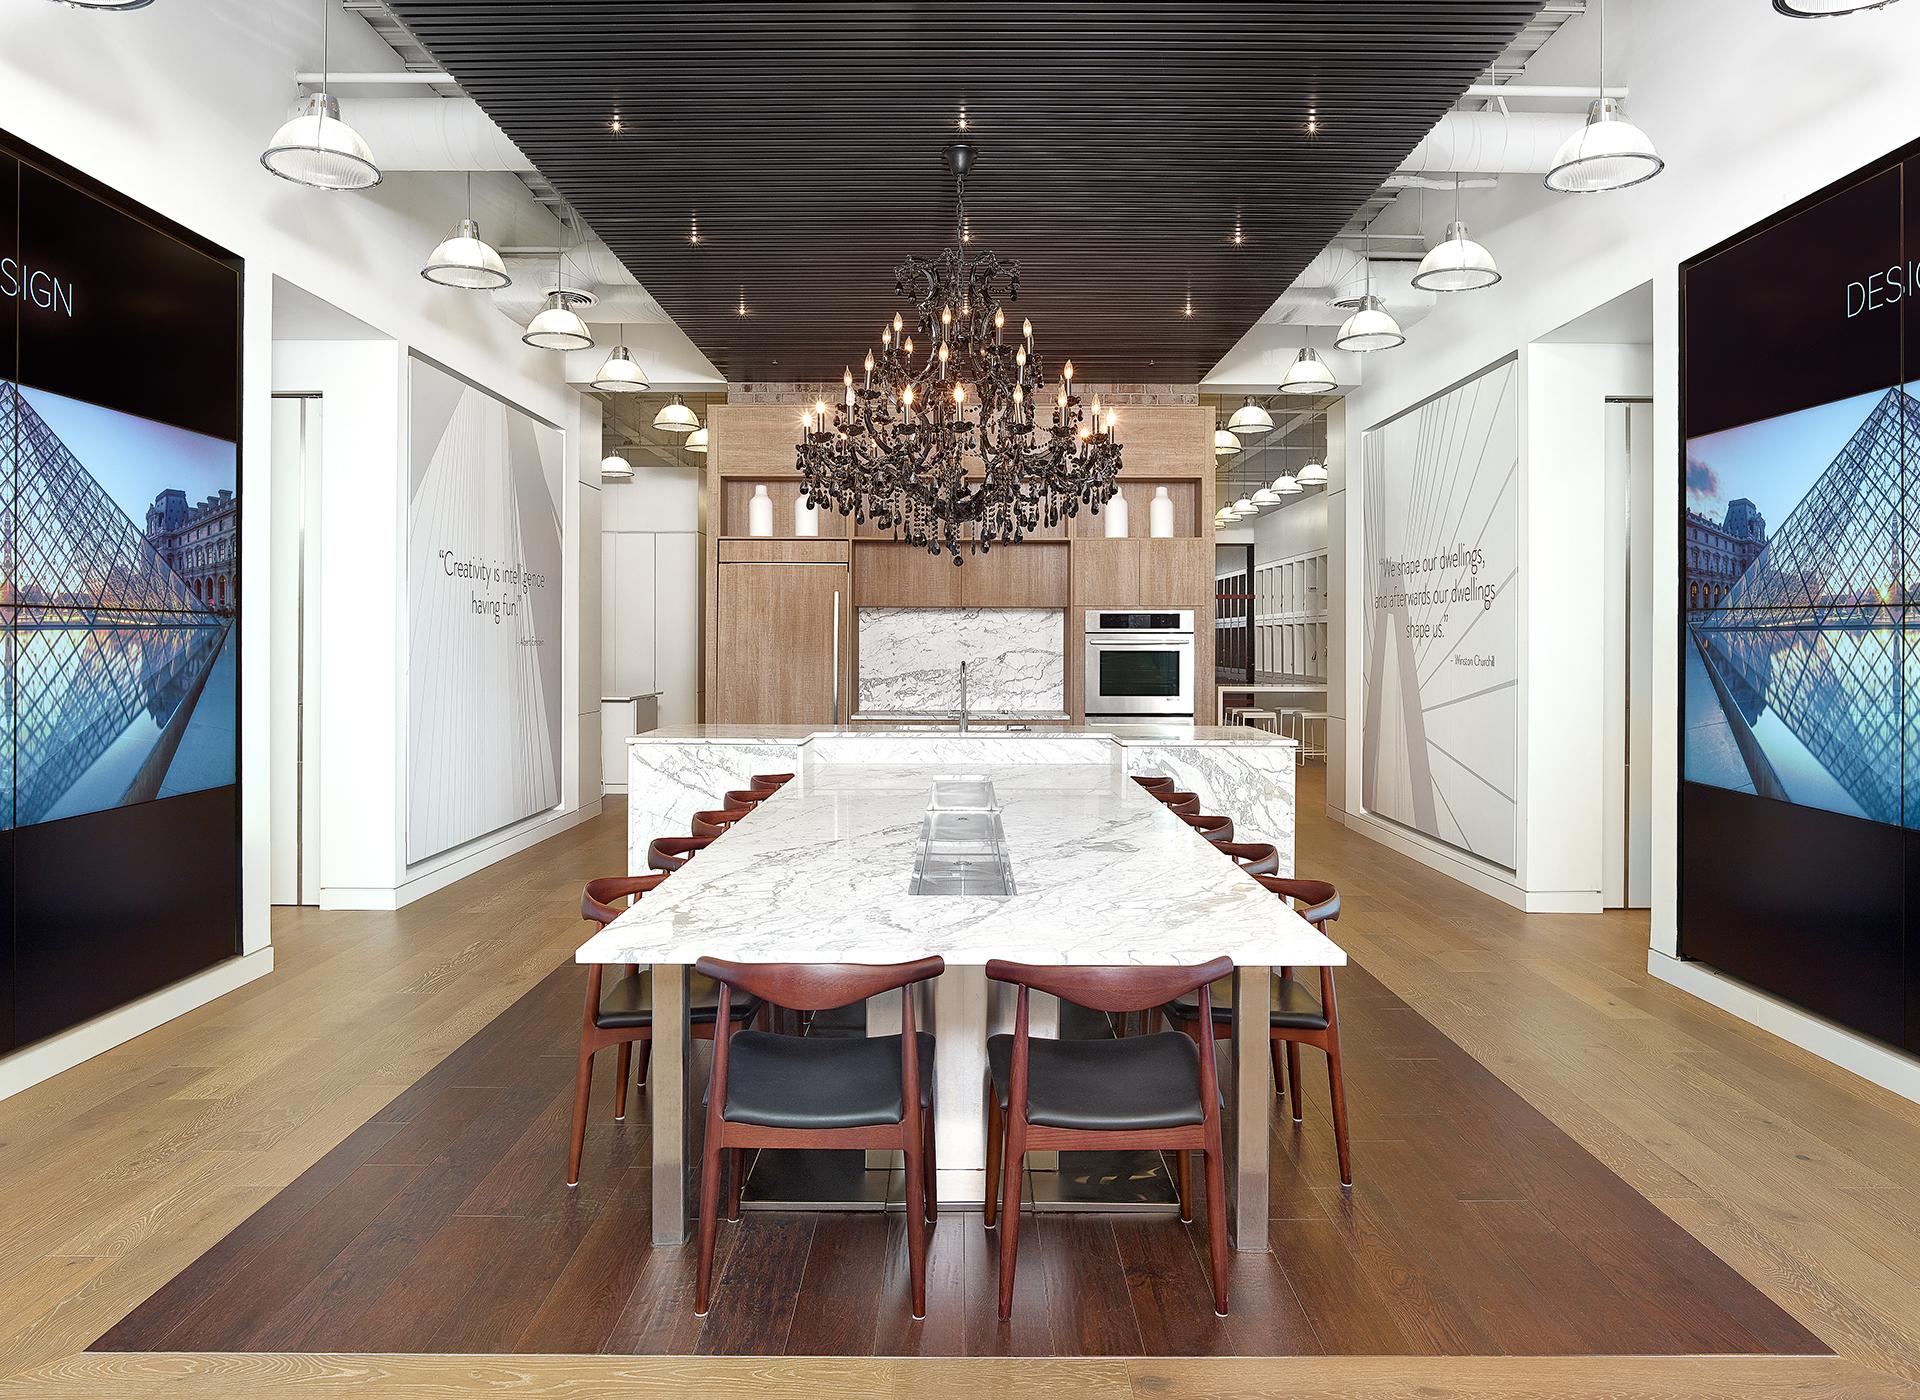 ©2017 Holger Obenaus Photography Interior Design Showroom Commercial